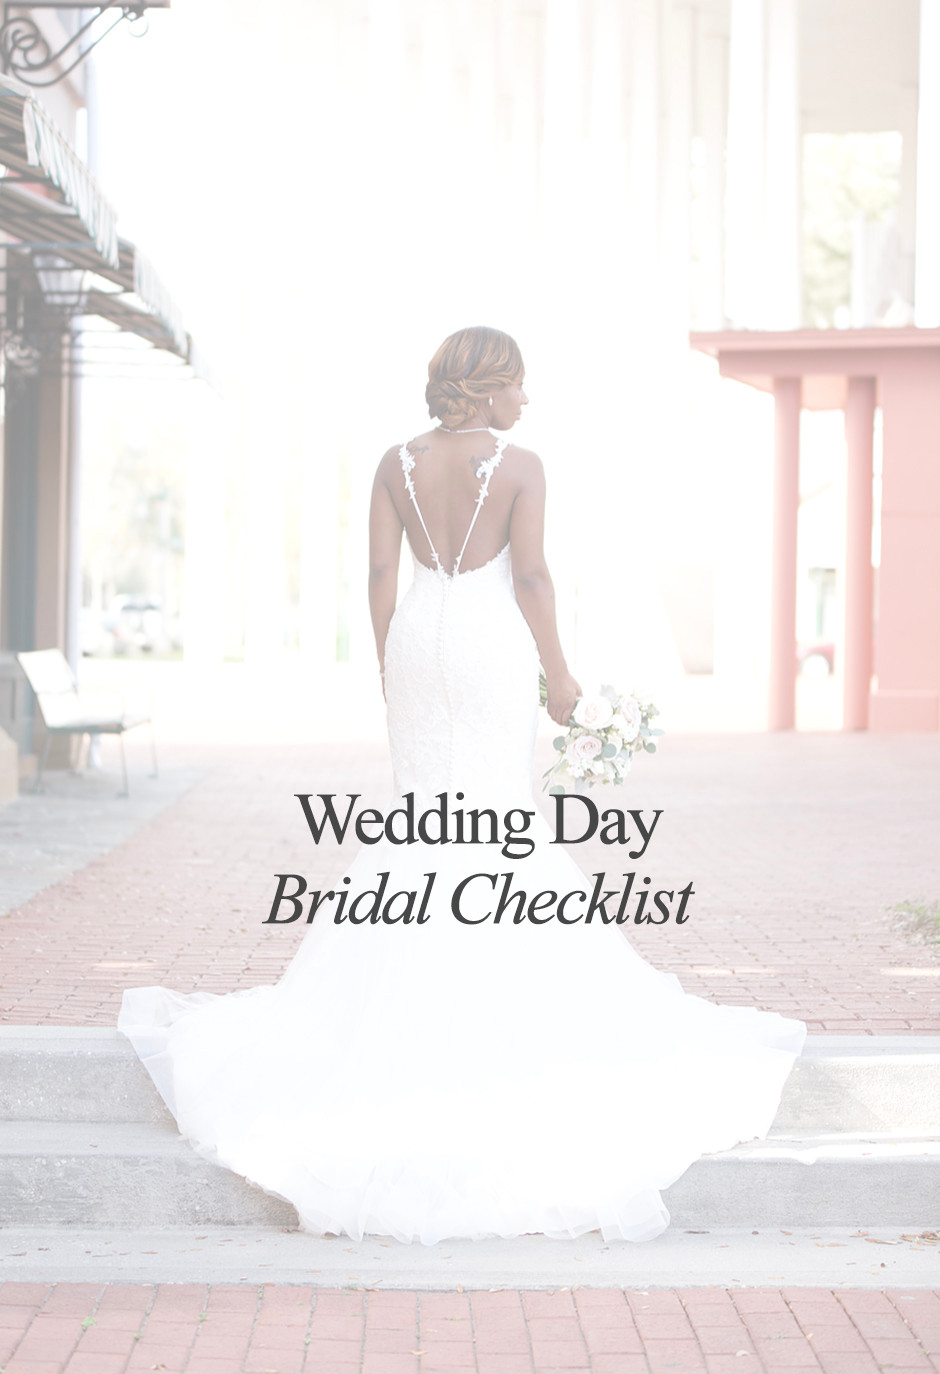 Wedding Day Bridal Checklist. Bride standing in gown holding bouquet.